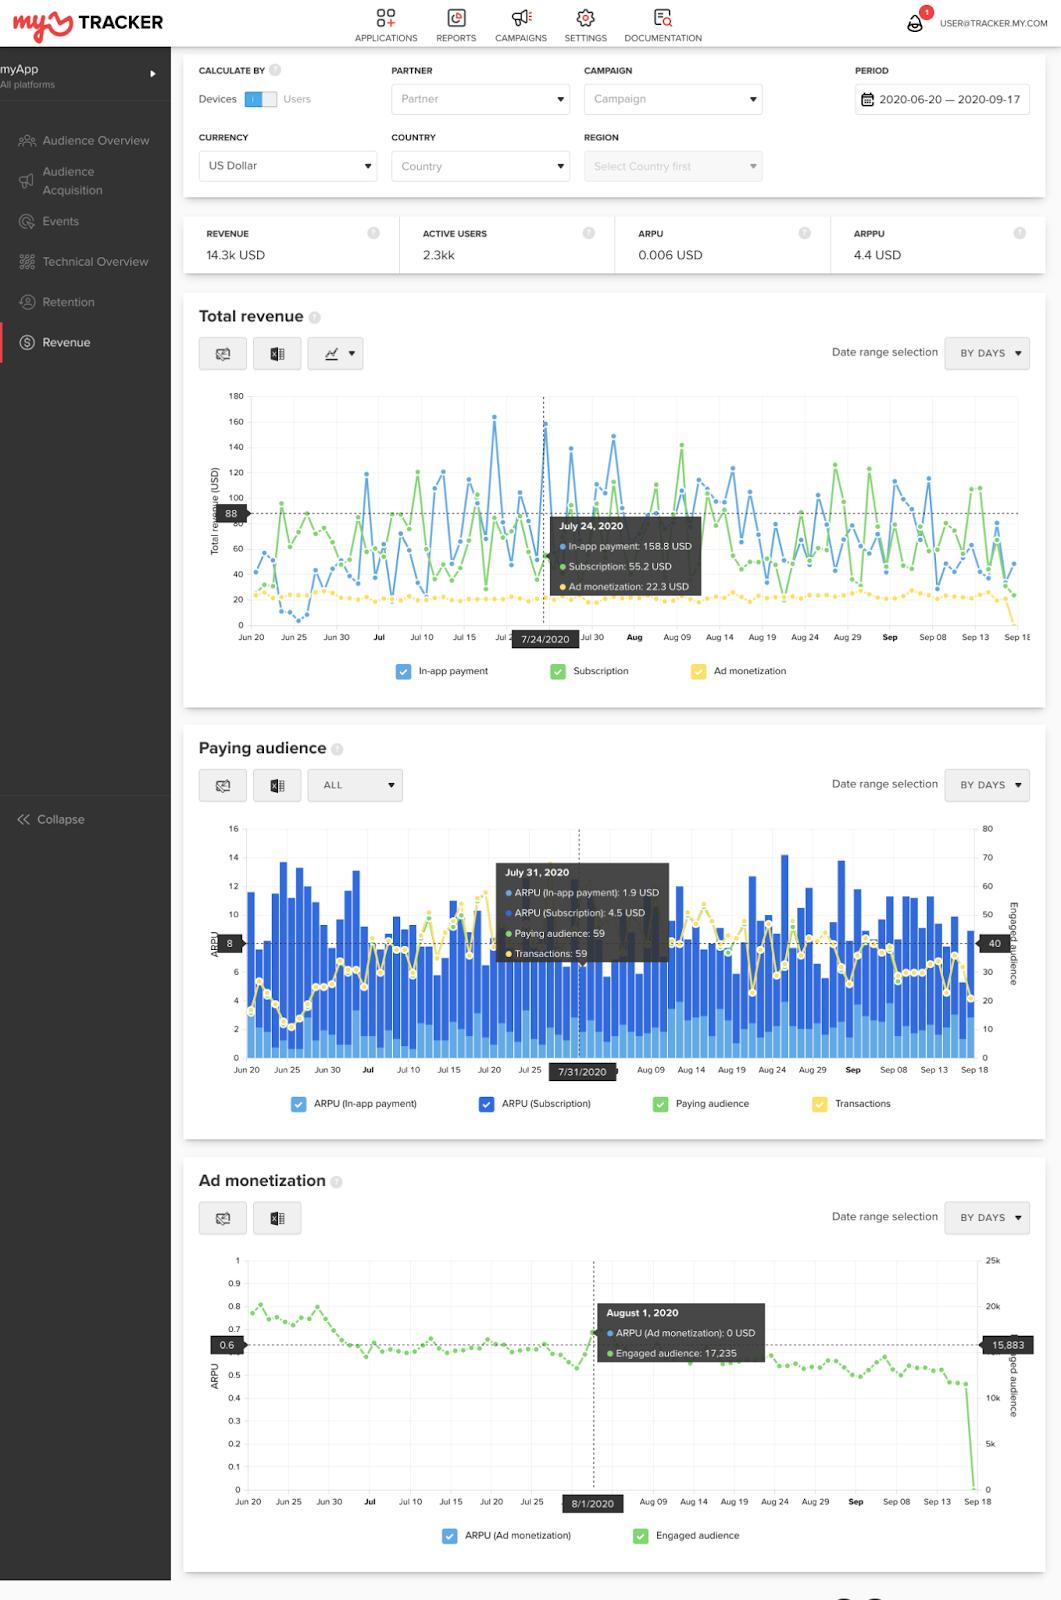 myTracker: Mobile Attribution and Analytics Platform